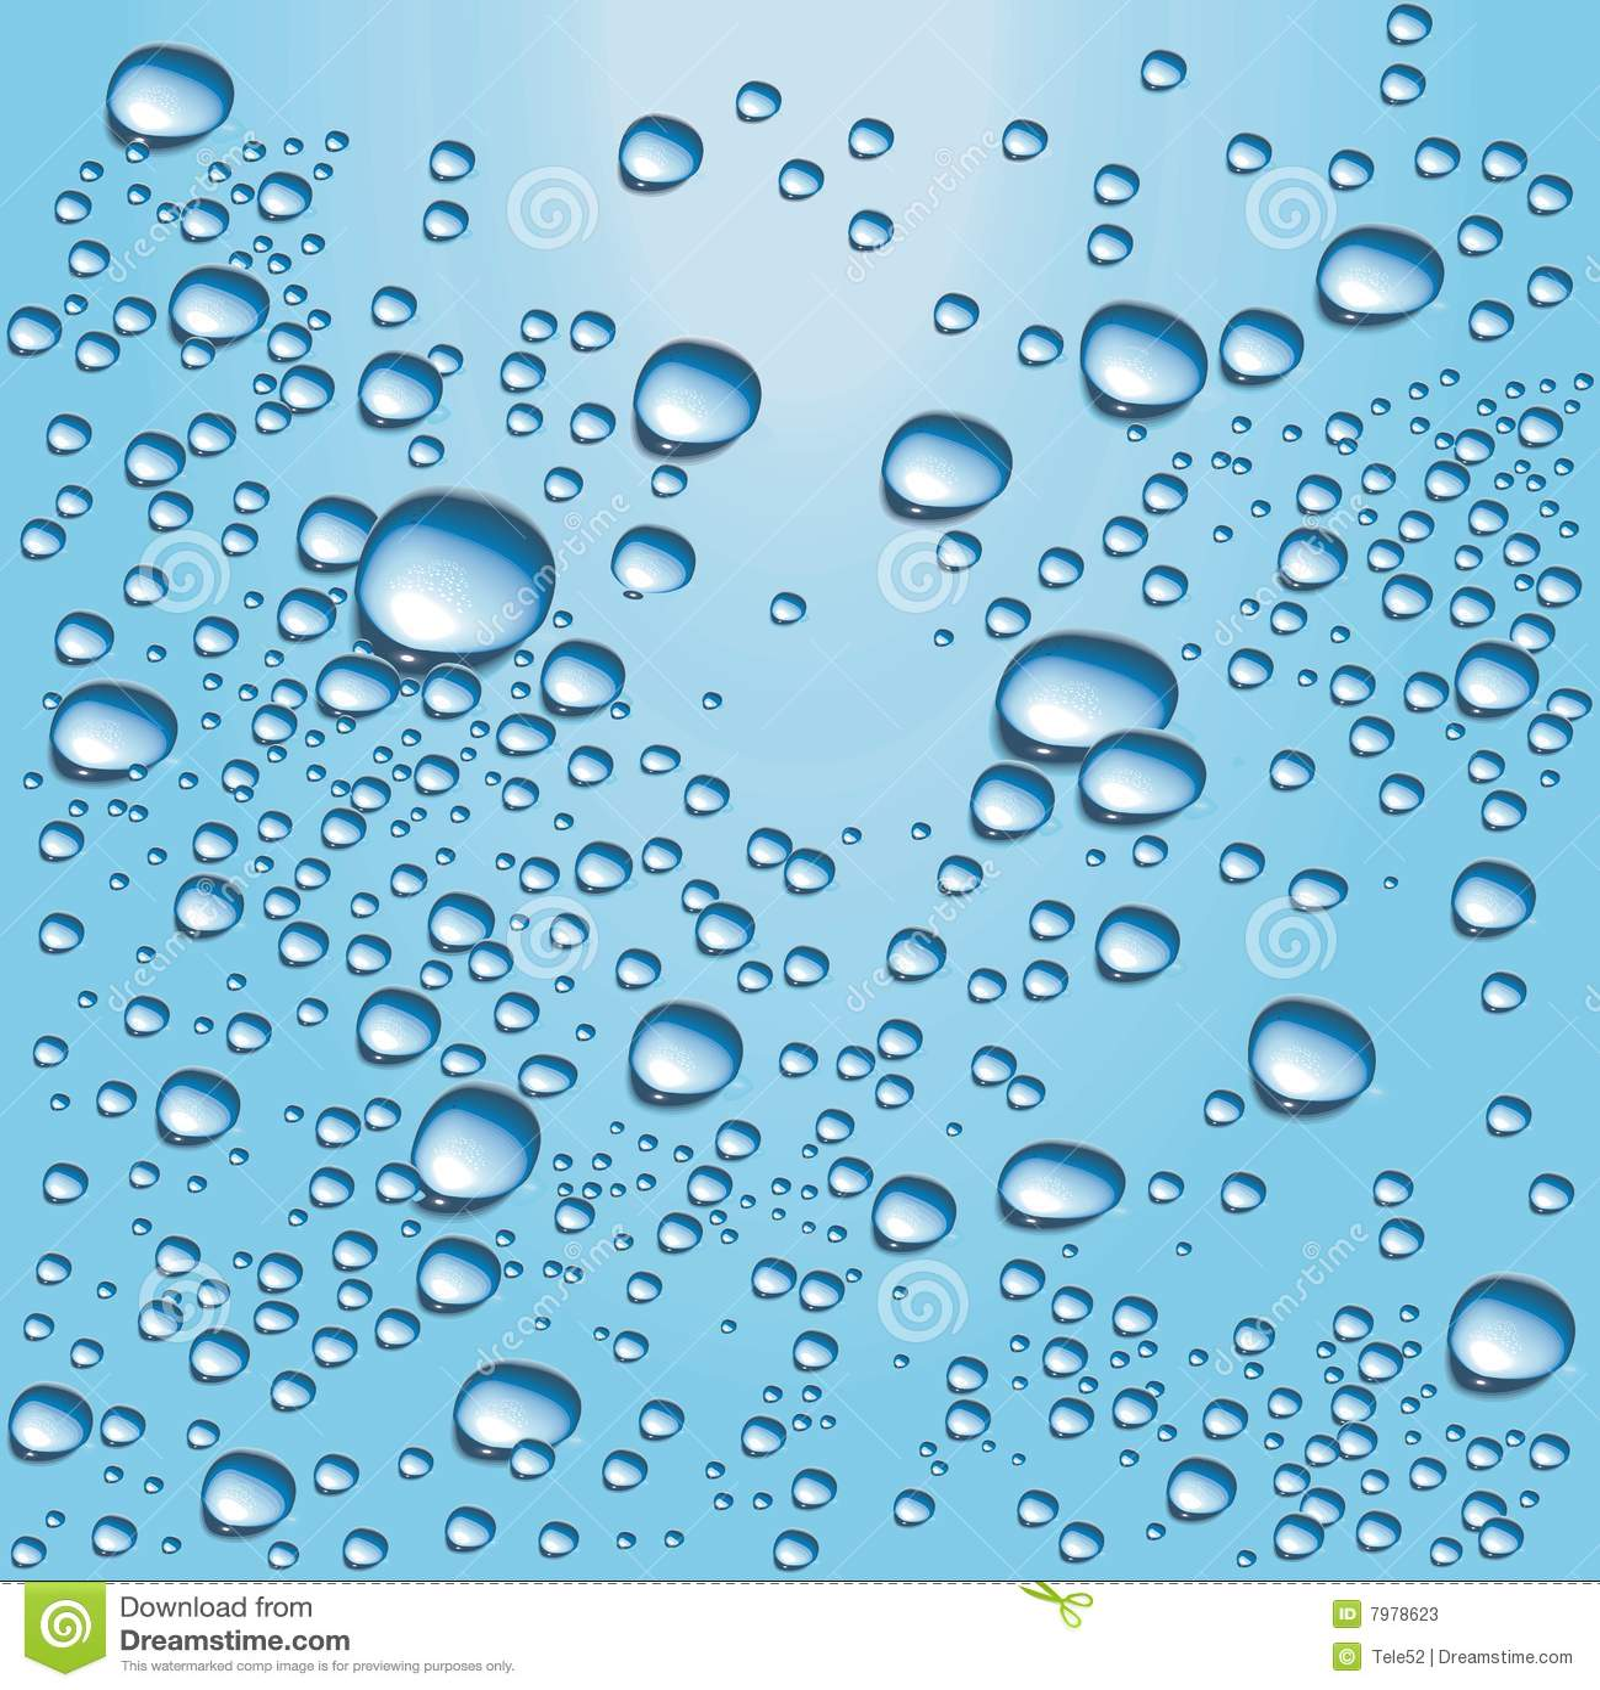 bubbles vector water - photo #19